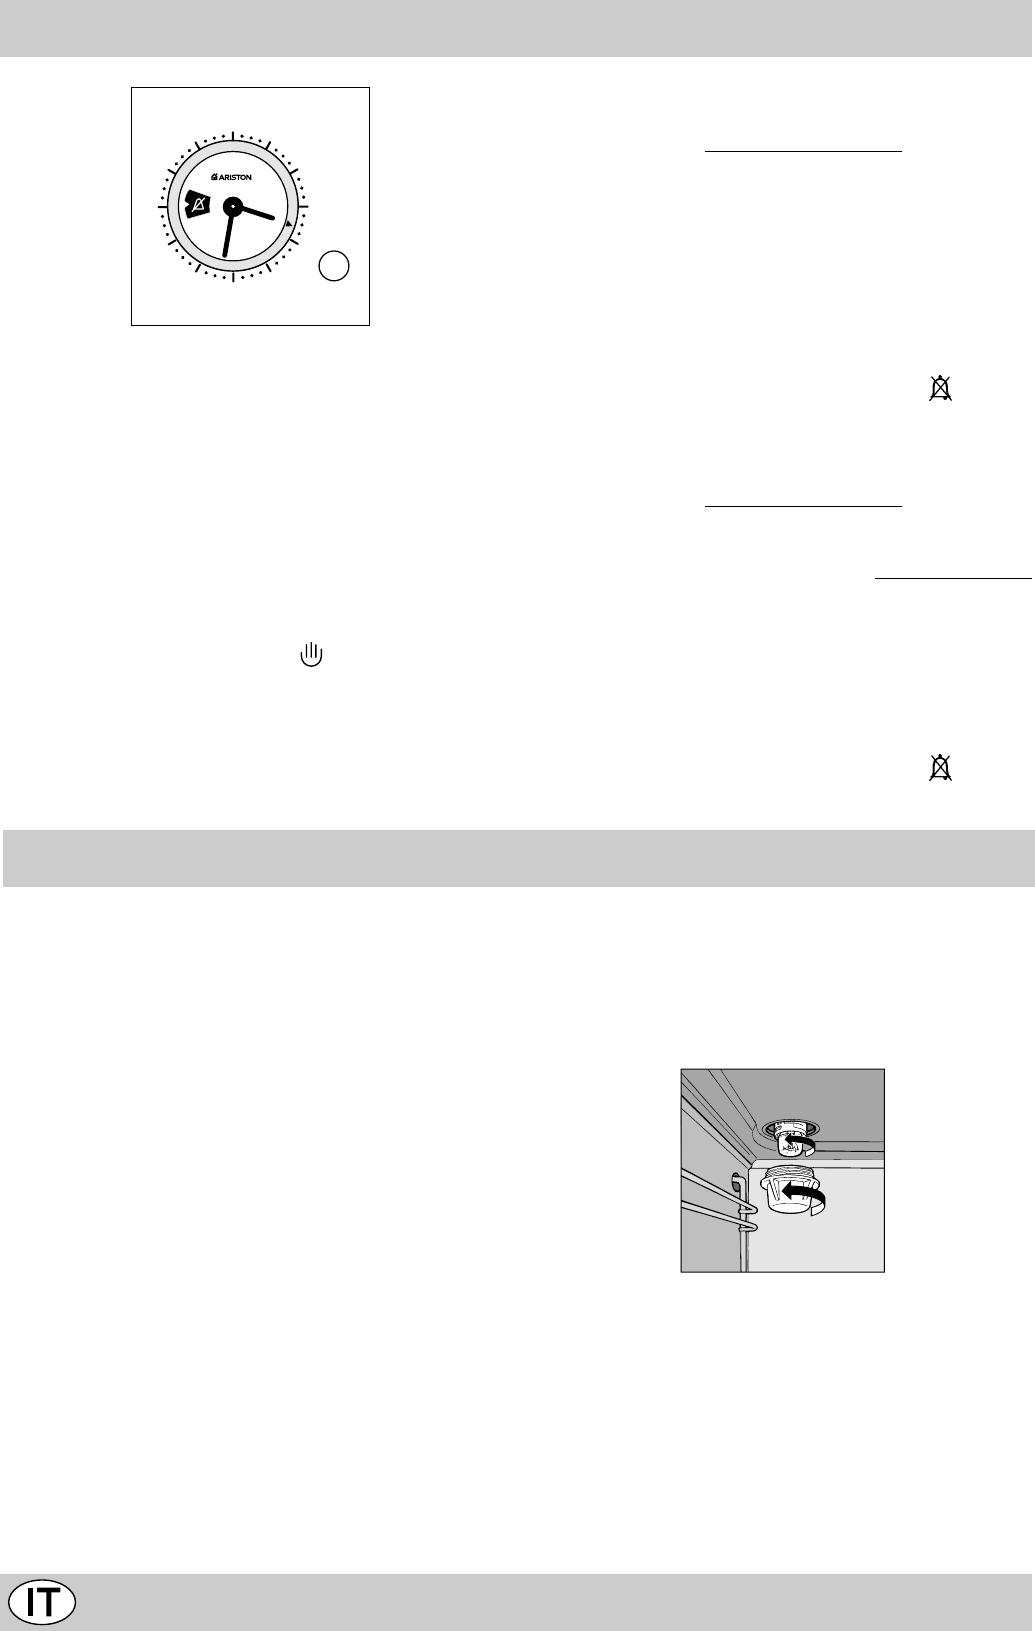 Handleiding Ariston Xf 905 Pagina 4 Van 52 Deutsch